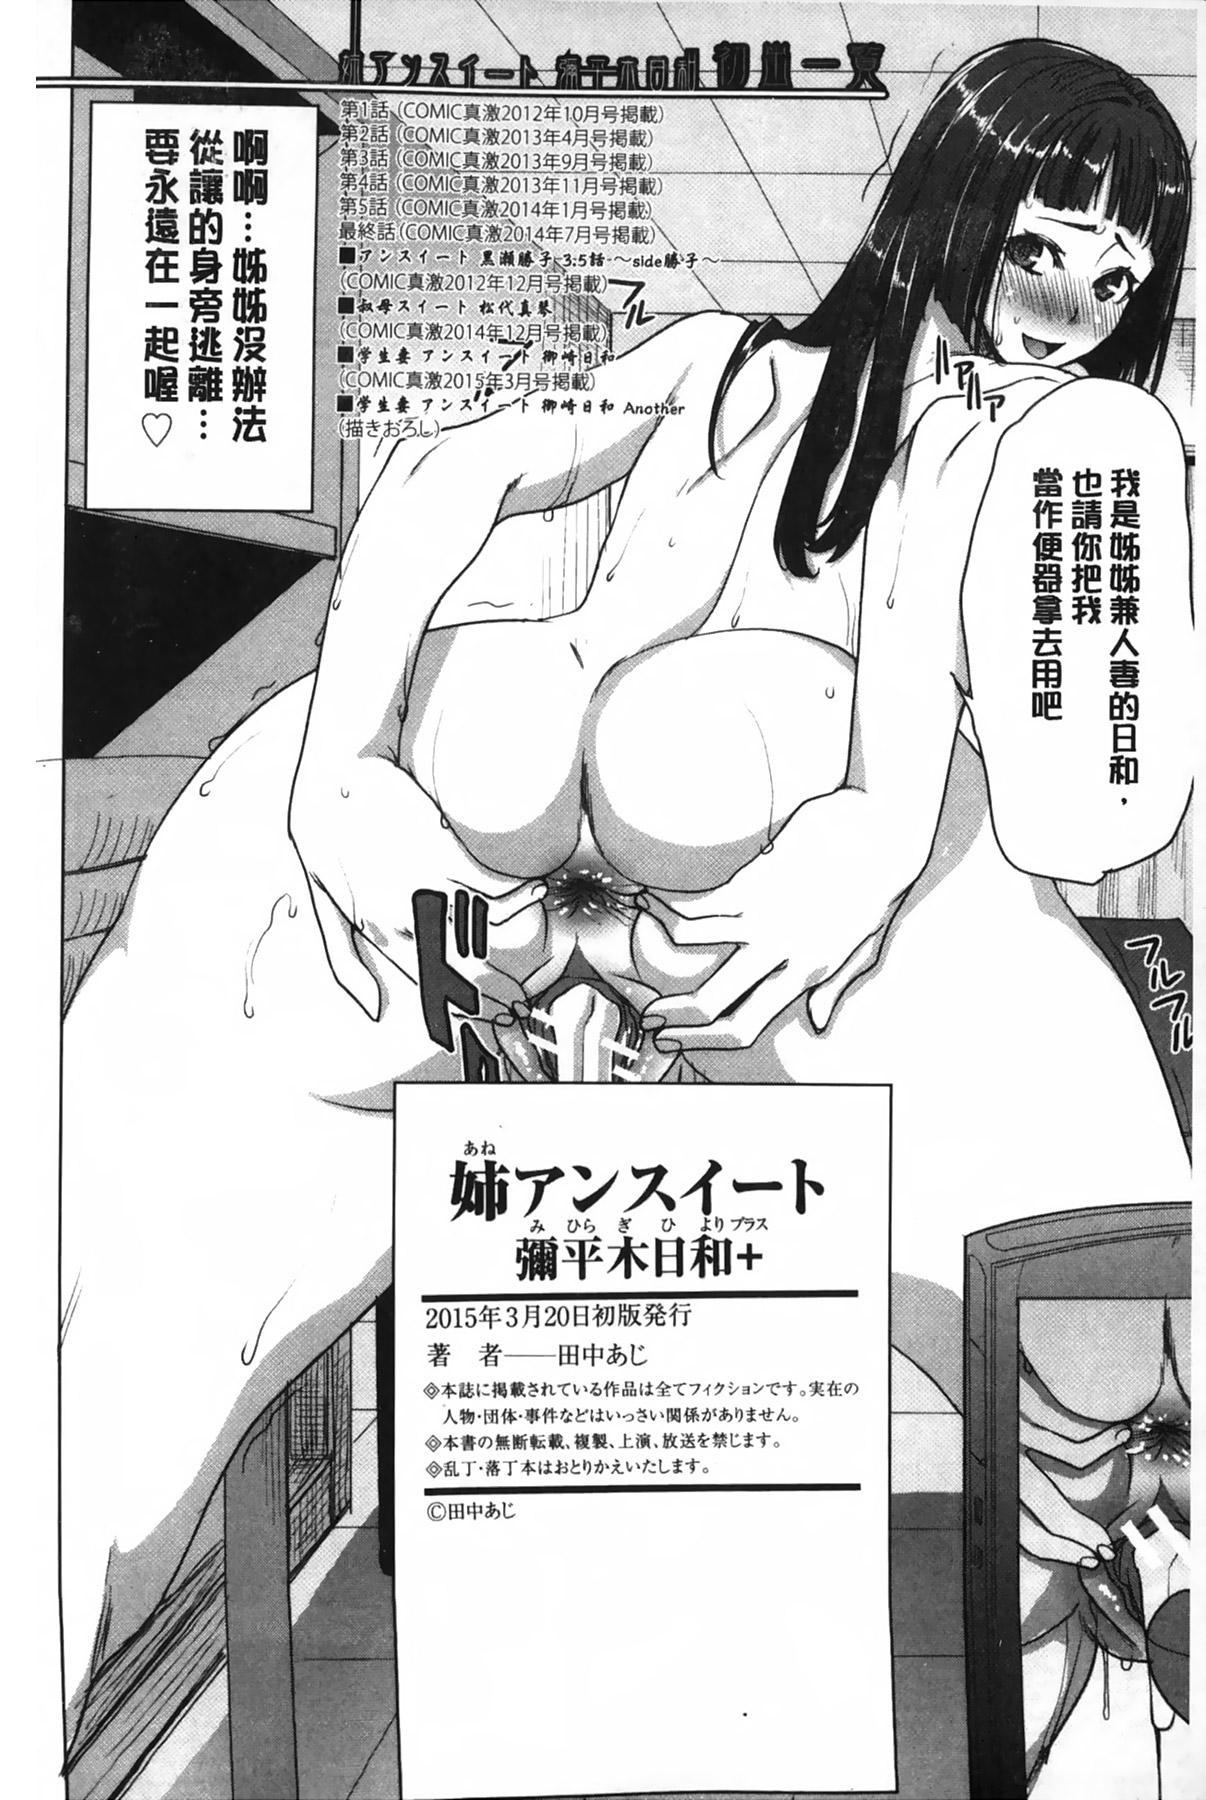 Ane Unsweet - Mihiragi Hiyori + | 姊姊不甜美 彌平木日和+ 208